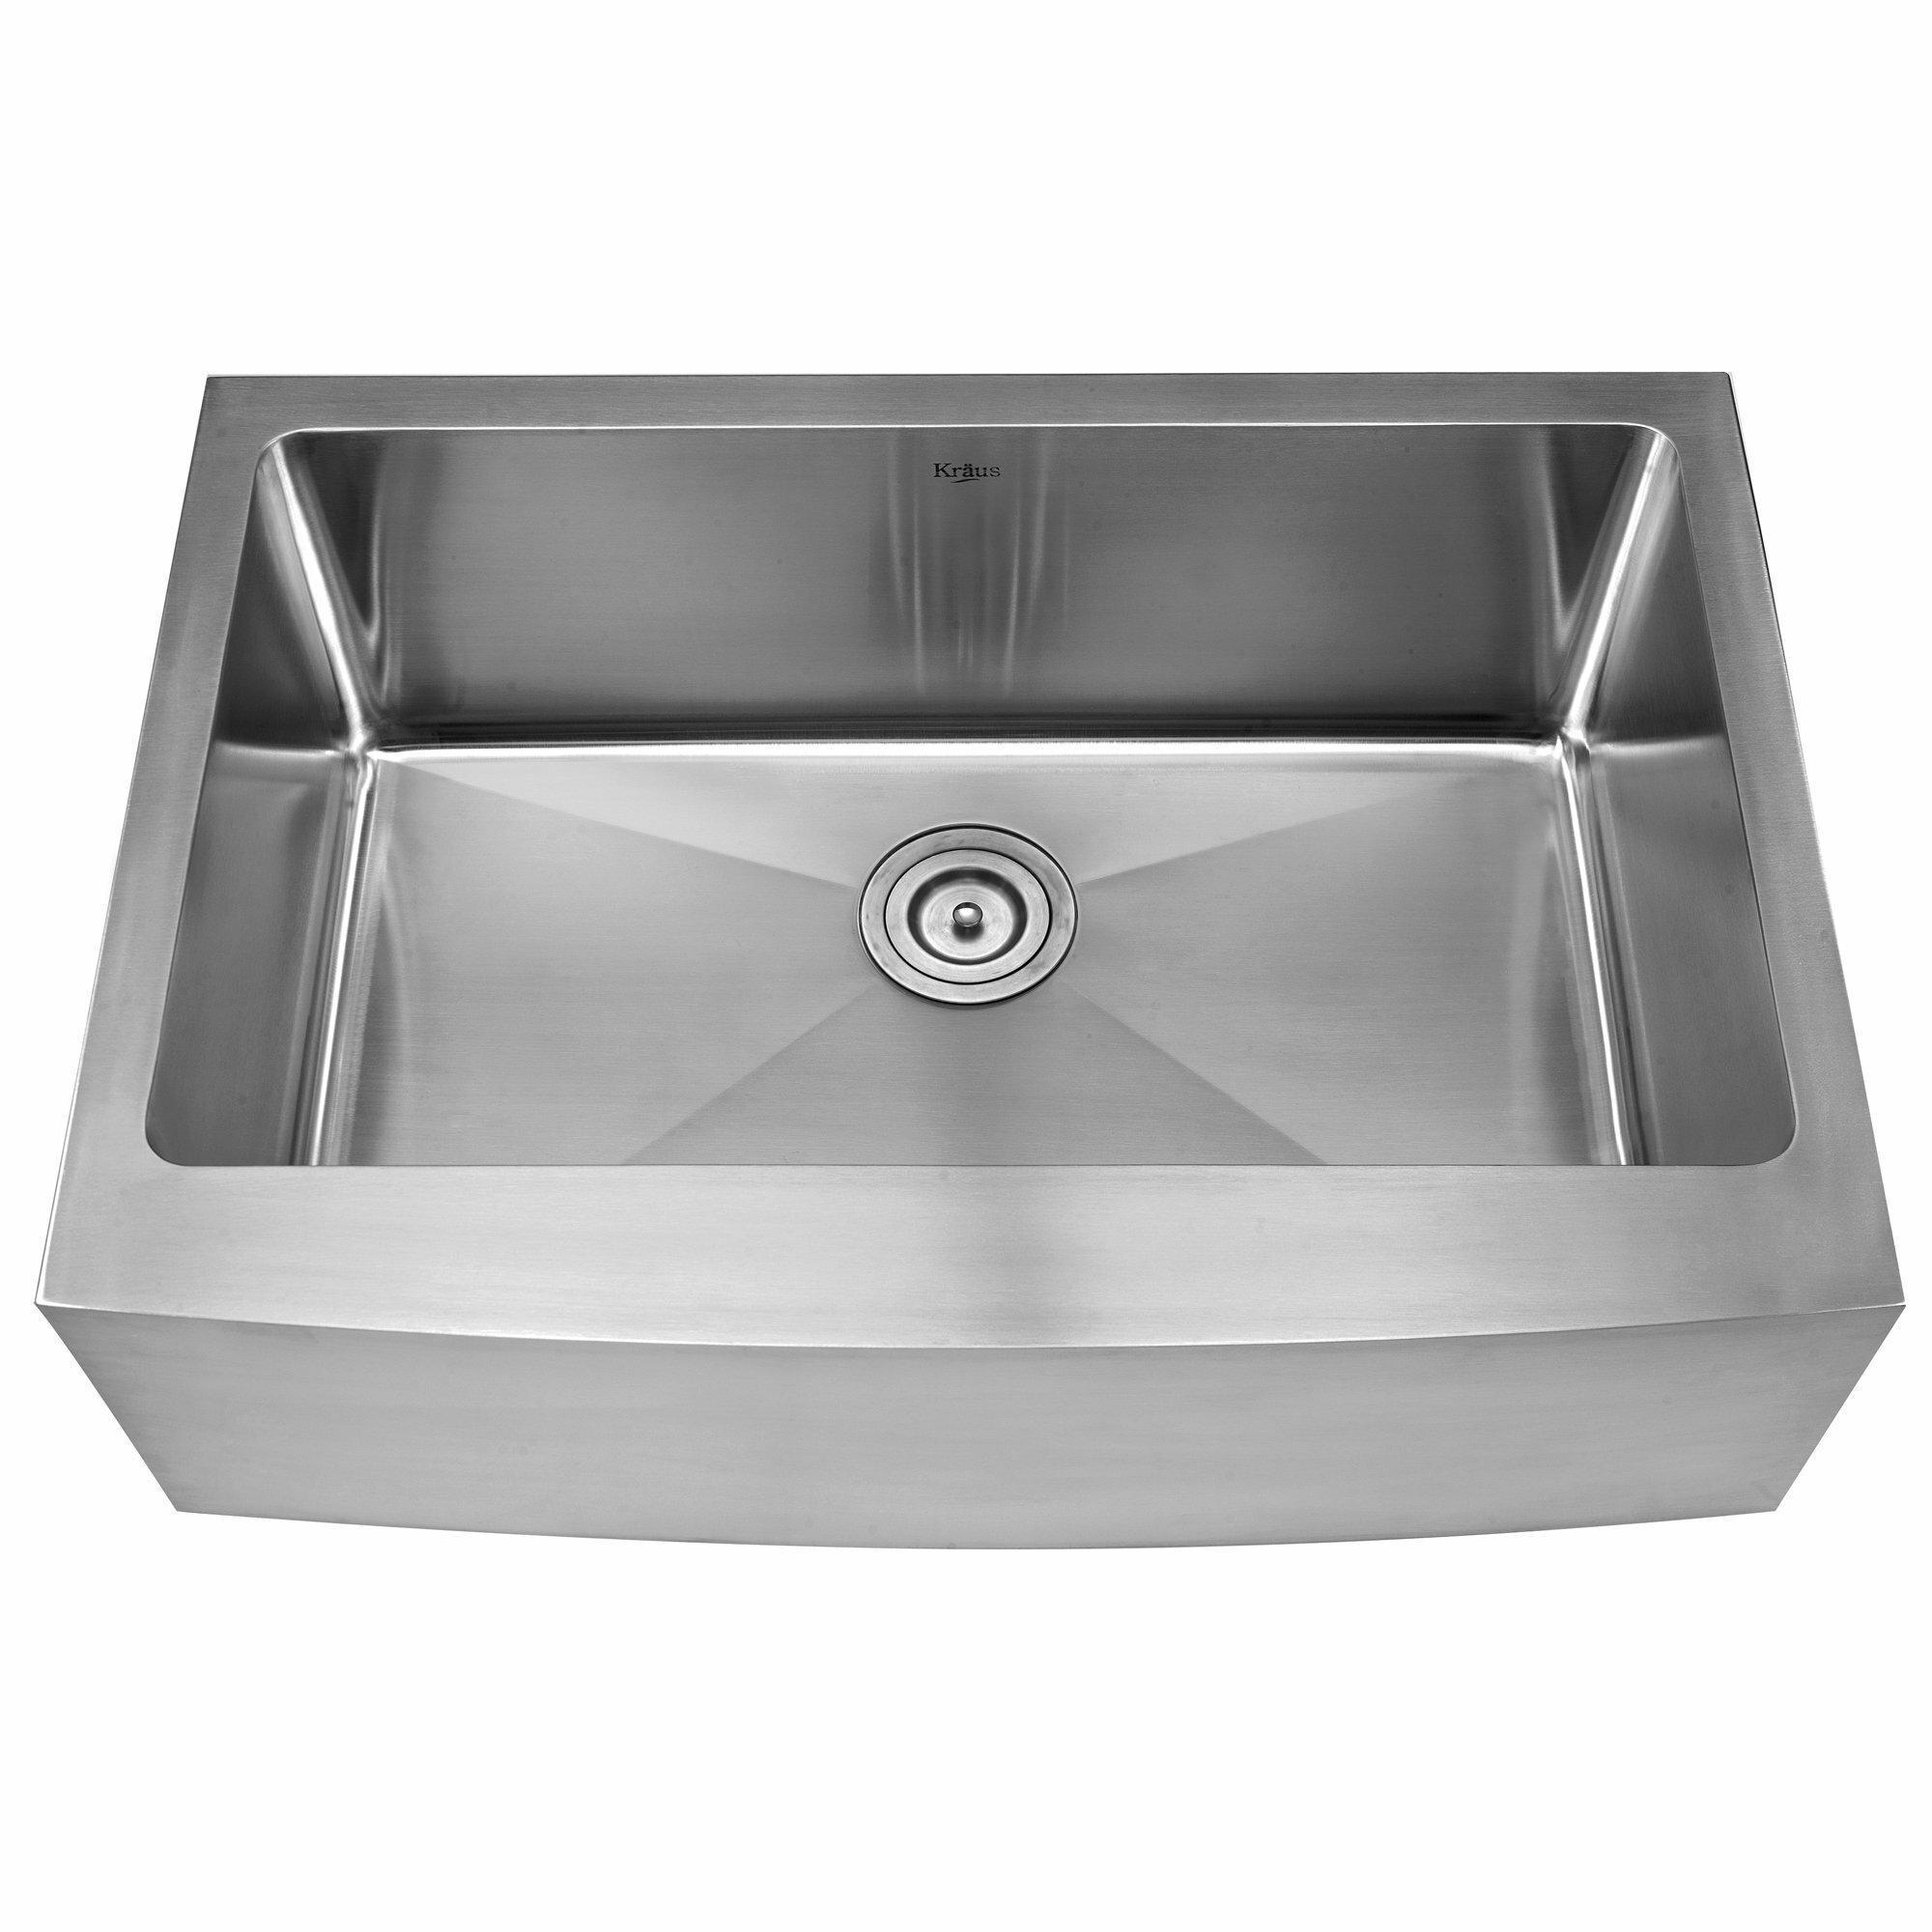 Kraus 29 X 20 Farmhouse Kitchen Sink Reviews Wayfair